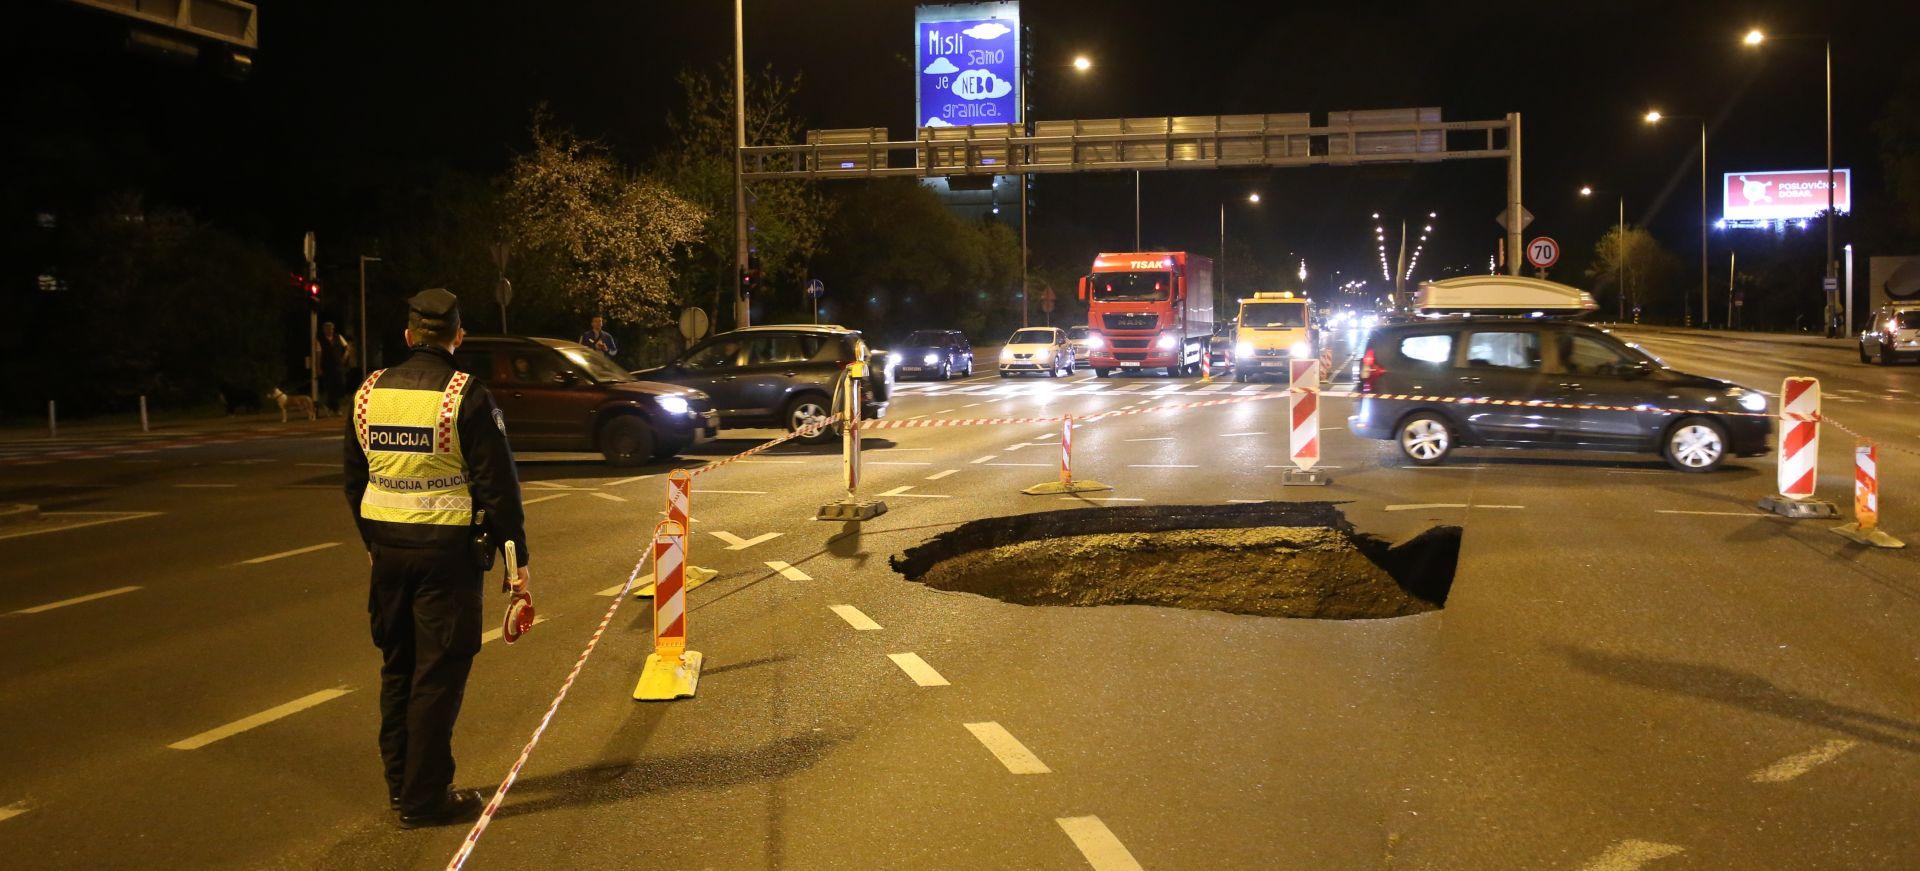 FOTO: VOZAČI, OPREZ! Urušio se asfalt na zagrebačkoj Slavonskoj aveniji